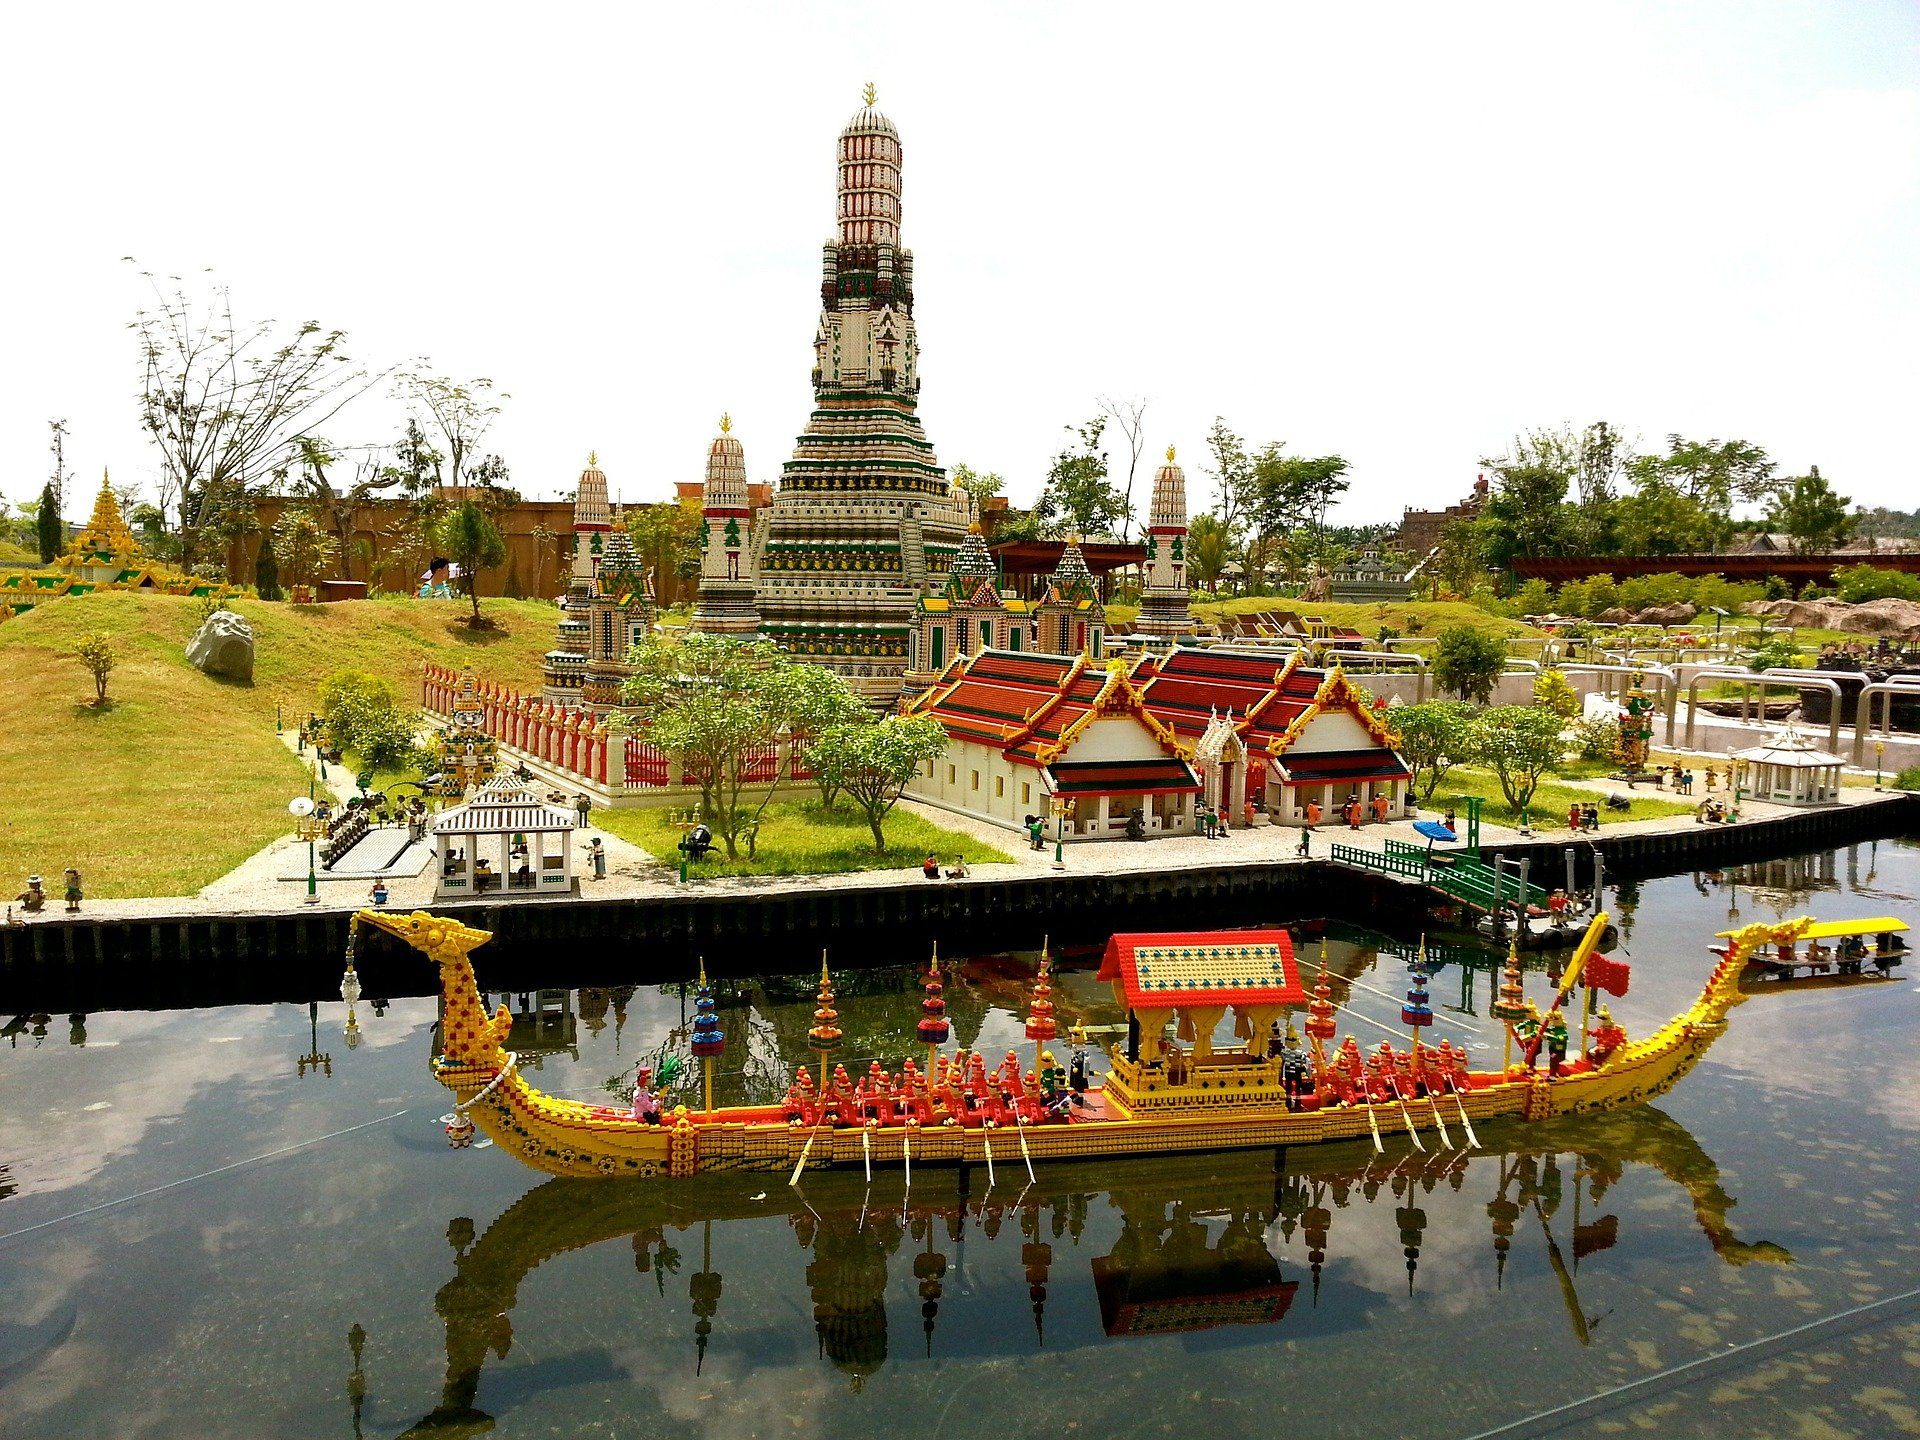 Legoland Malaysia near Johor Bahru